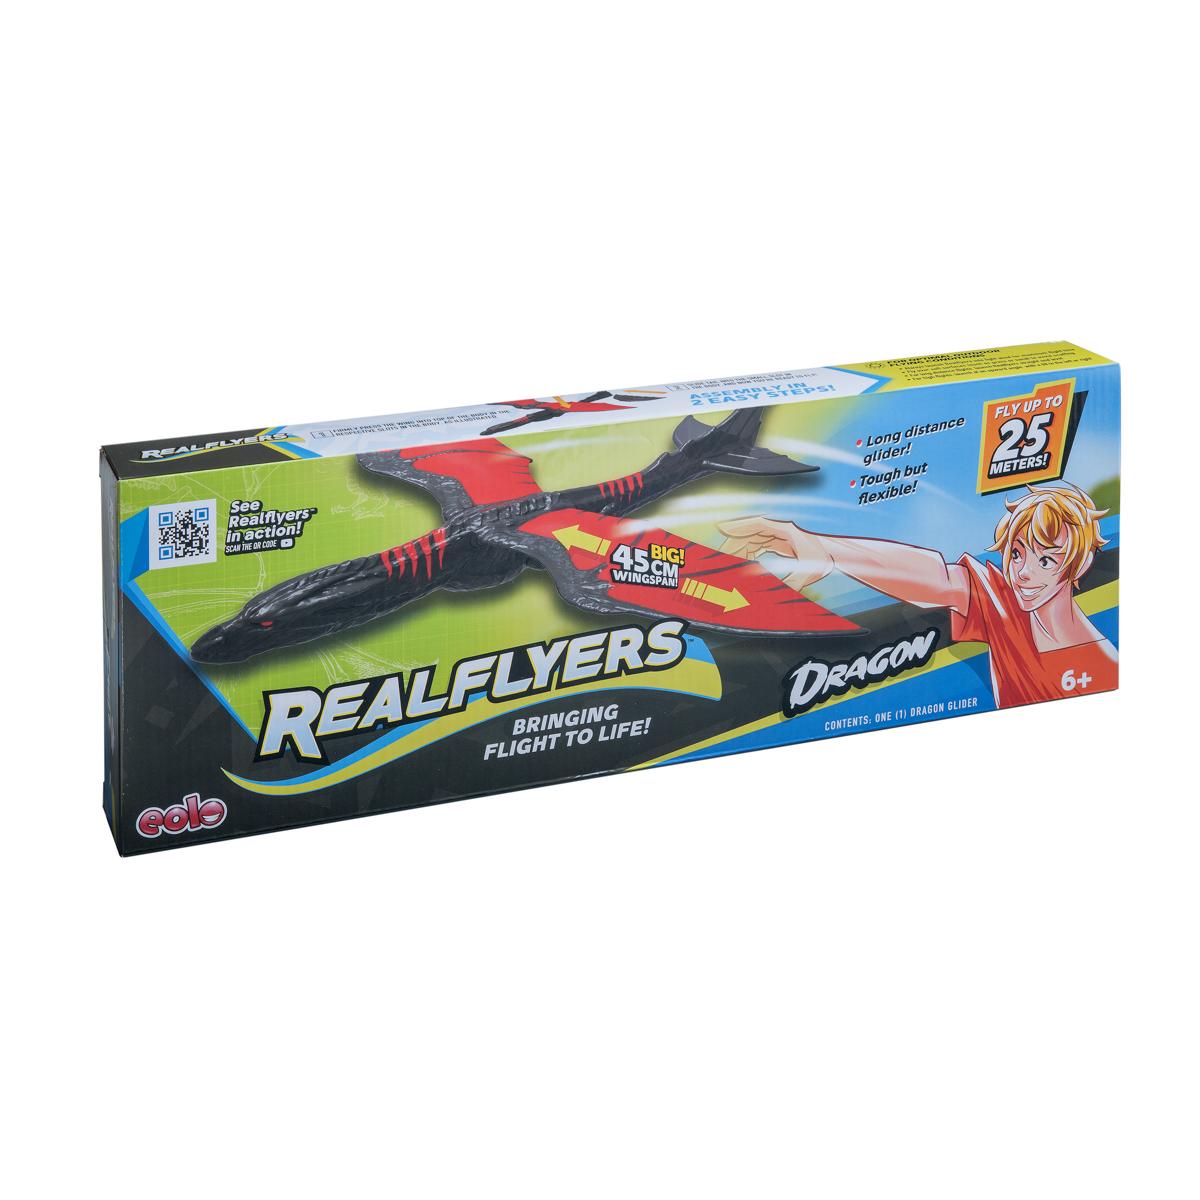 Realflyers Drake 45 cm